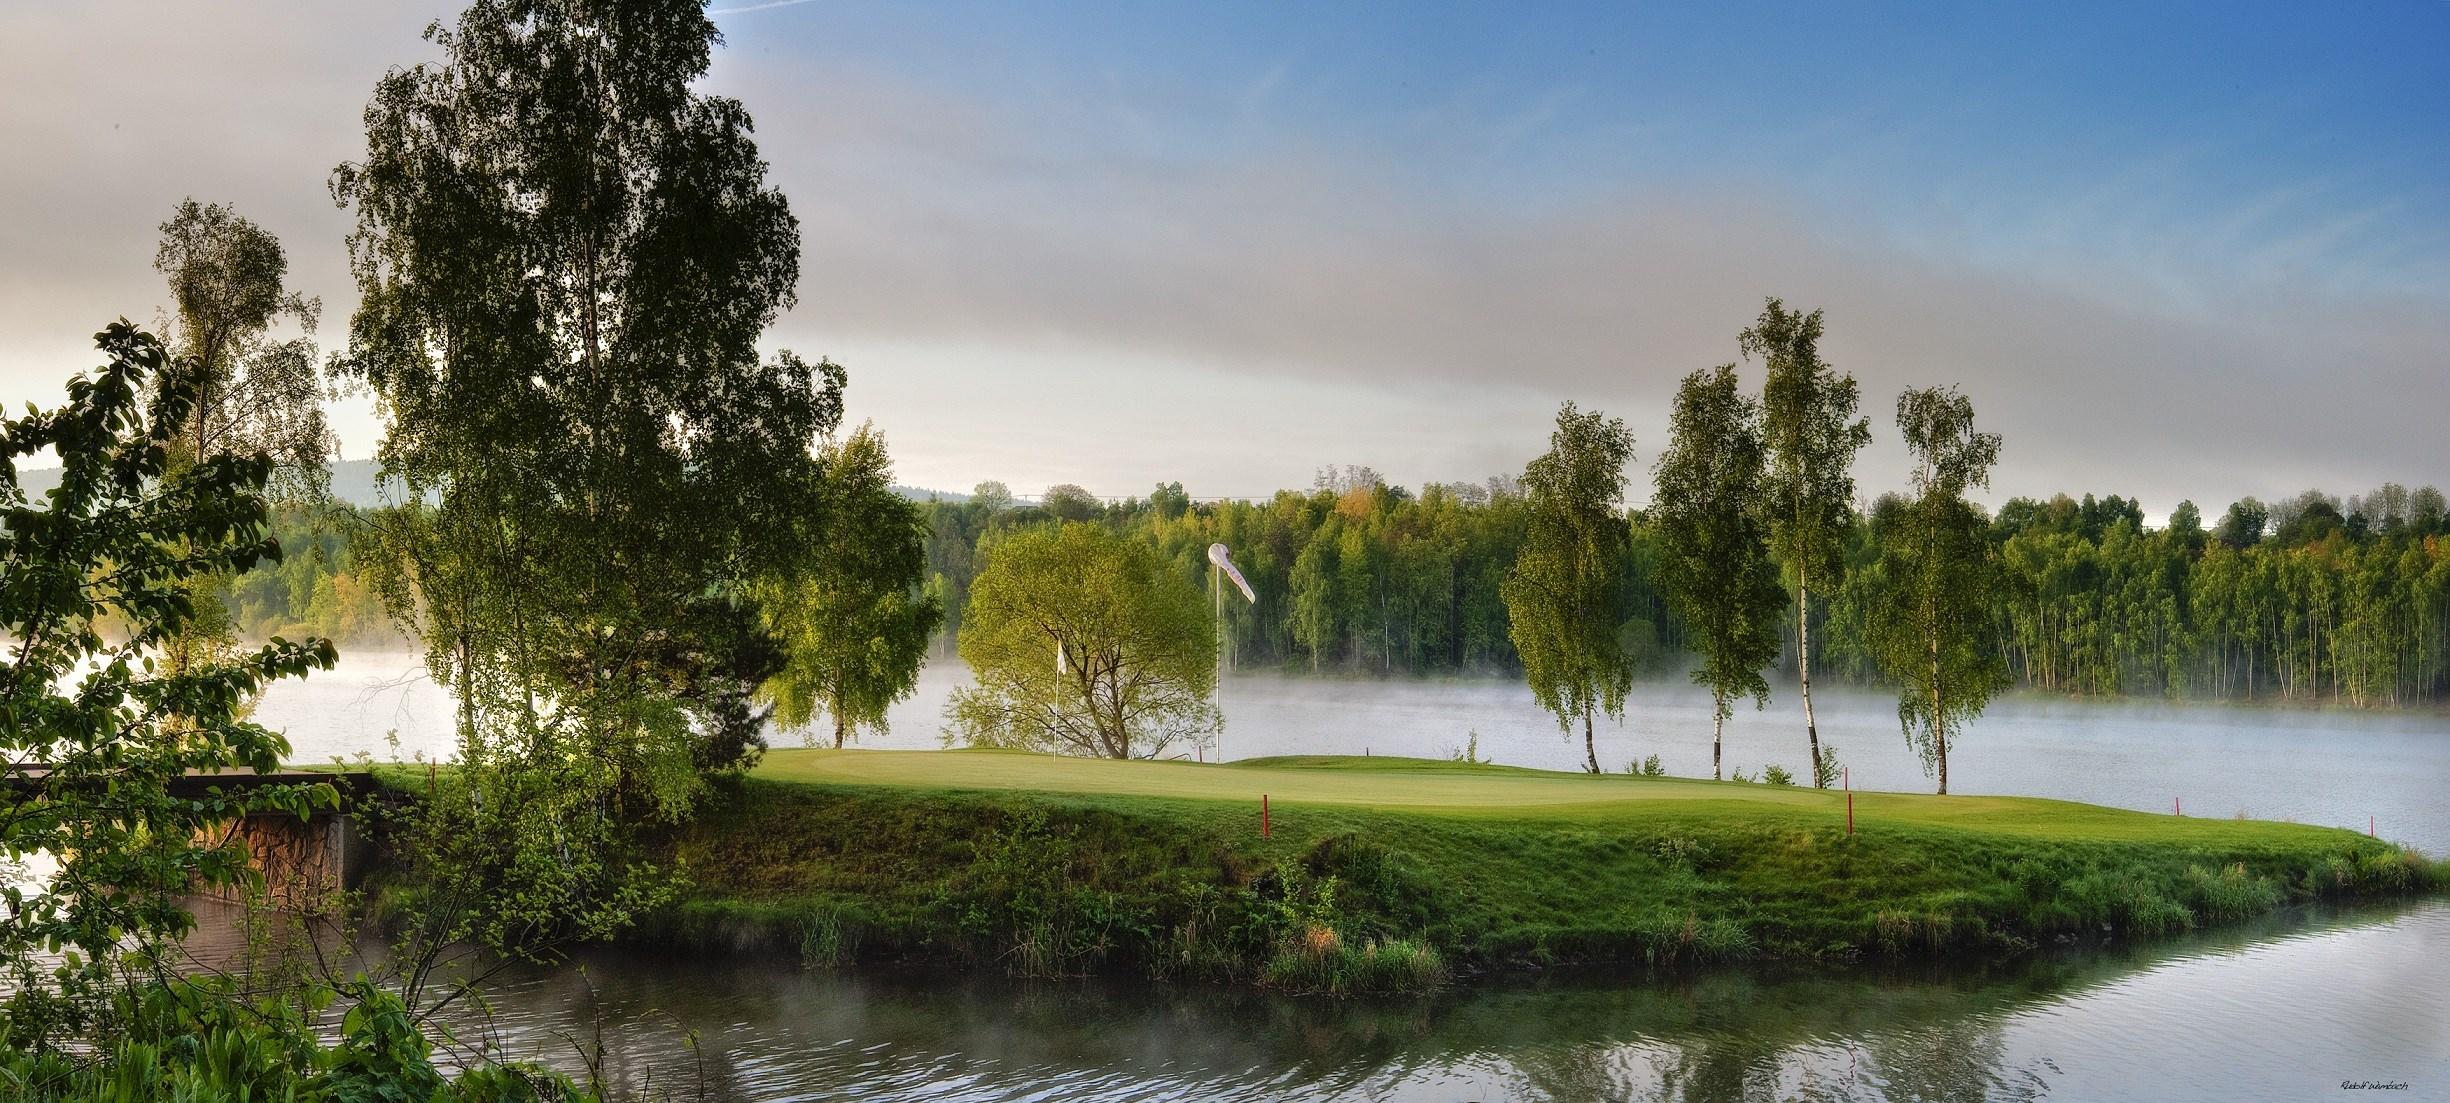 Golf_Greensgate_03.jpg